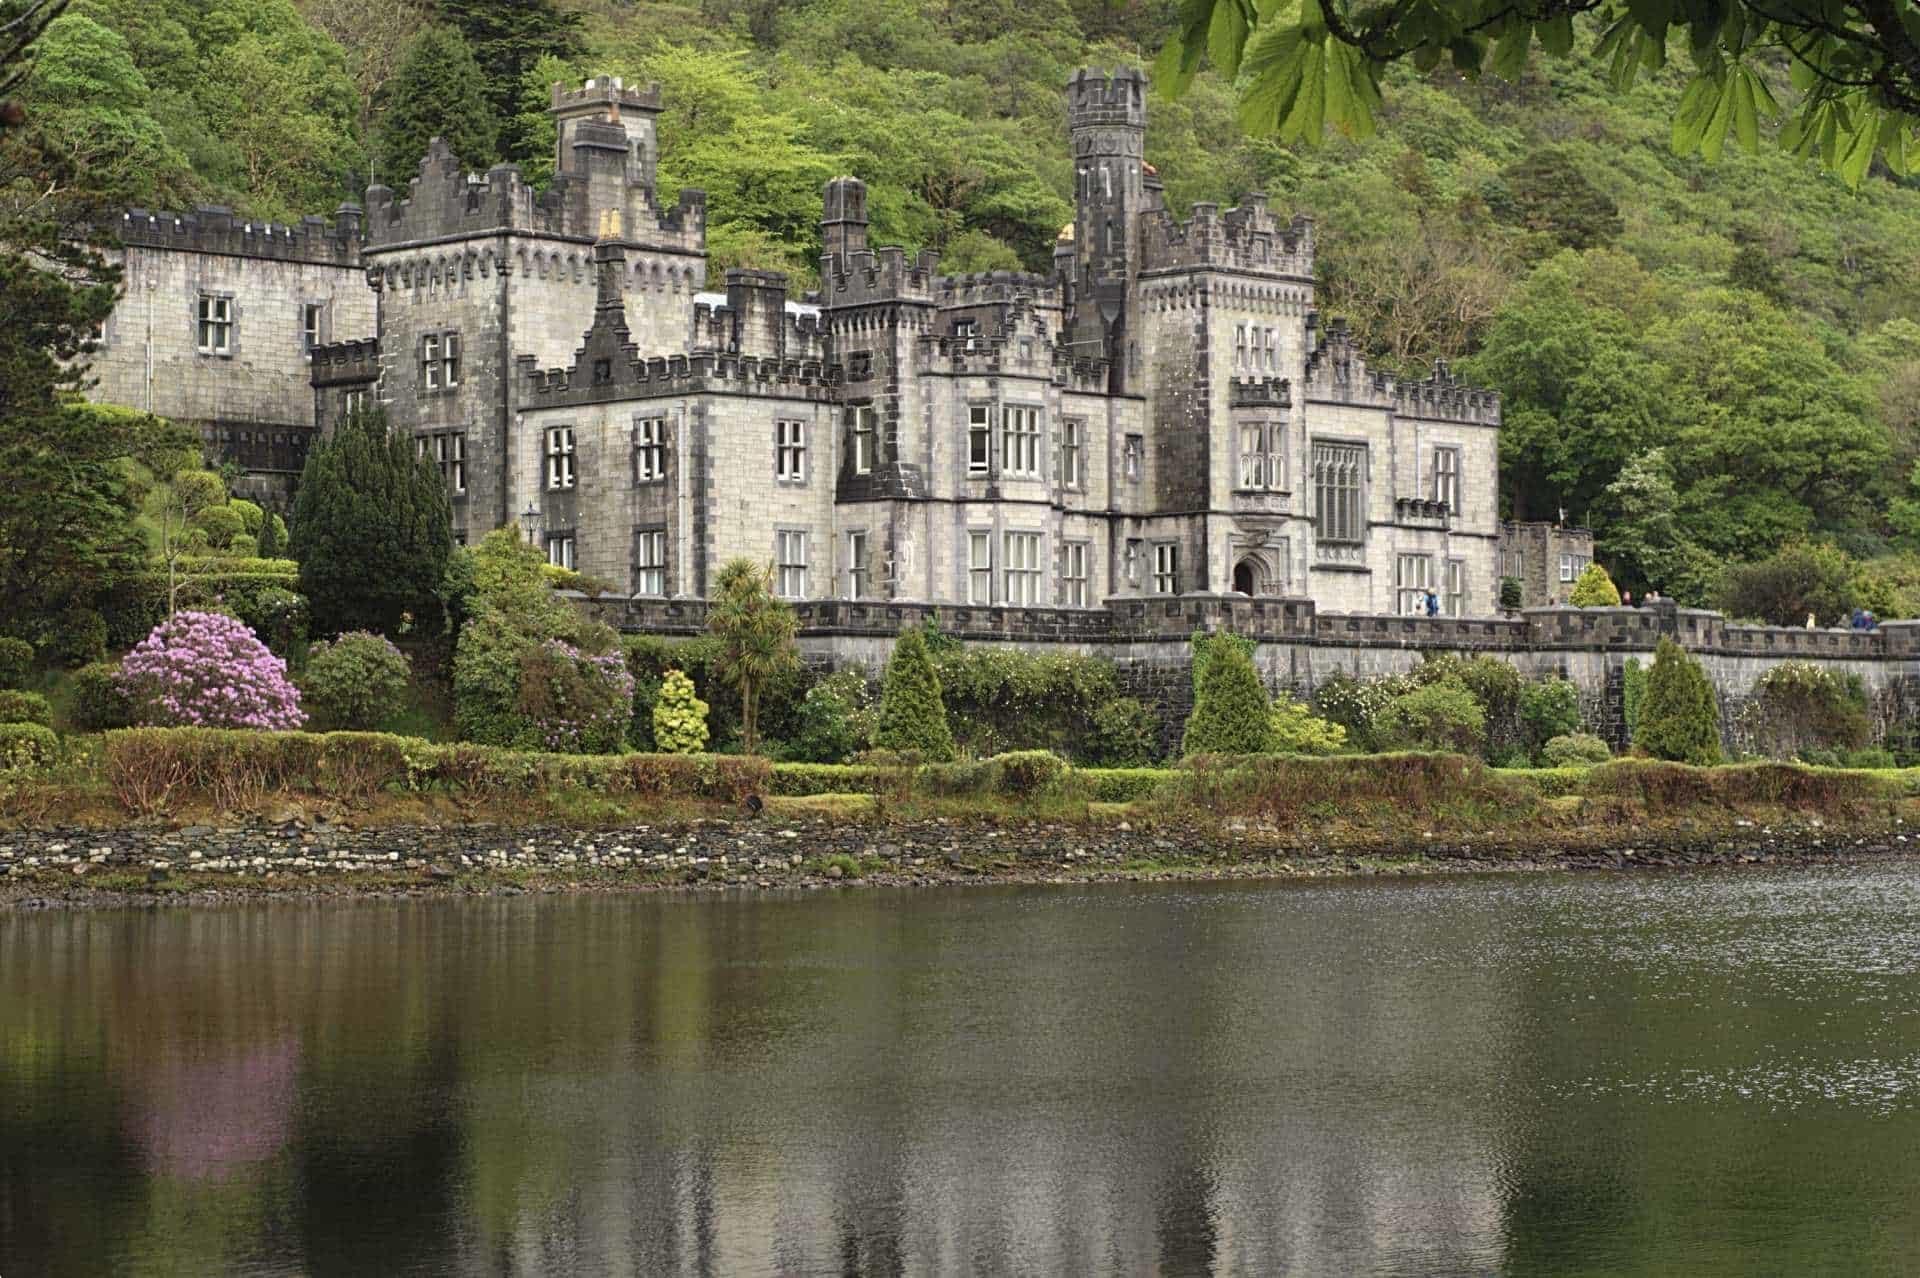 Gardens of Ireland Kylemore Abbey